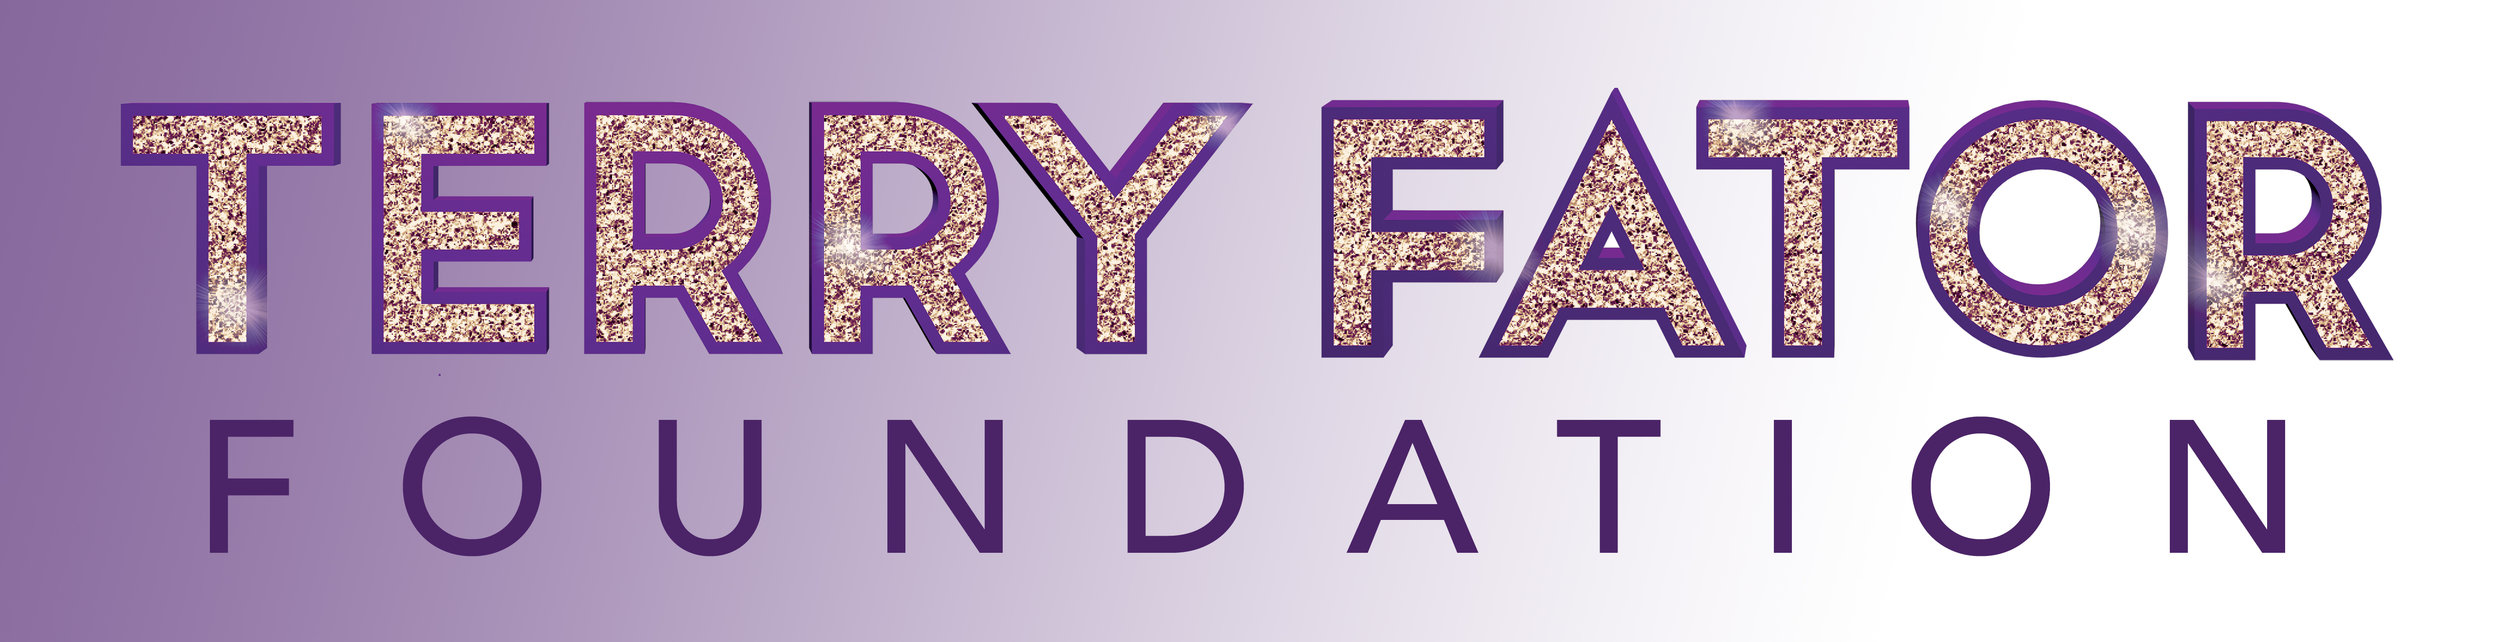 Terry Fator Foundation.jpg